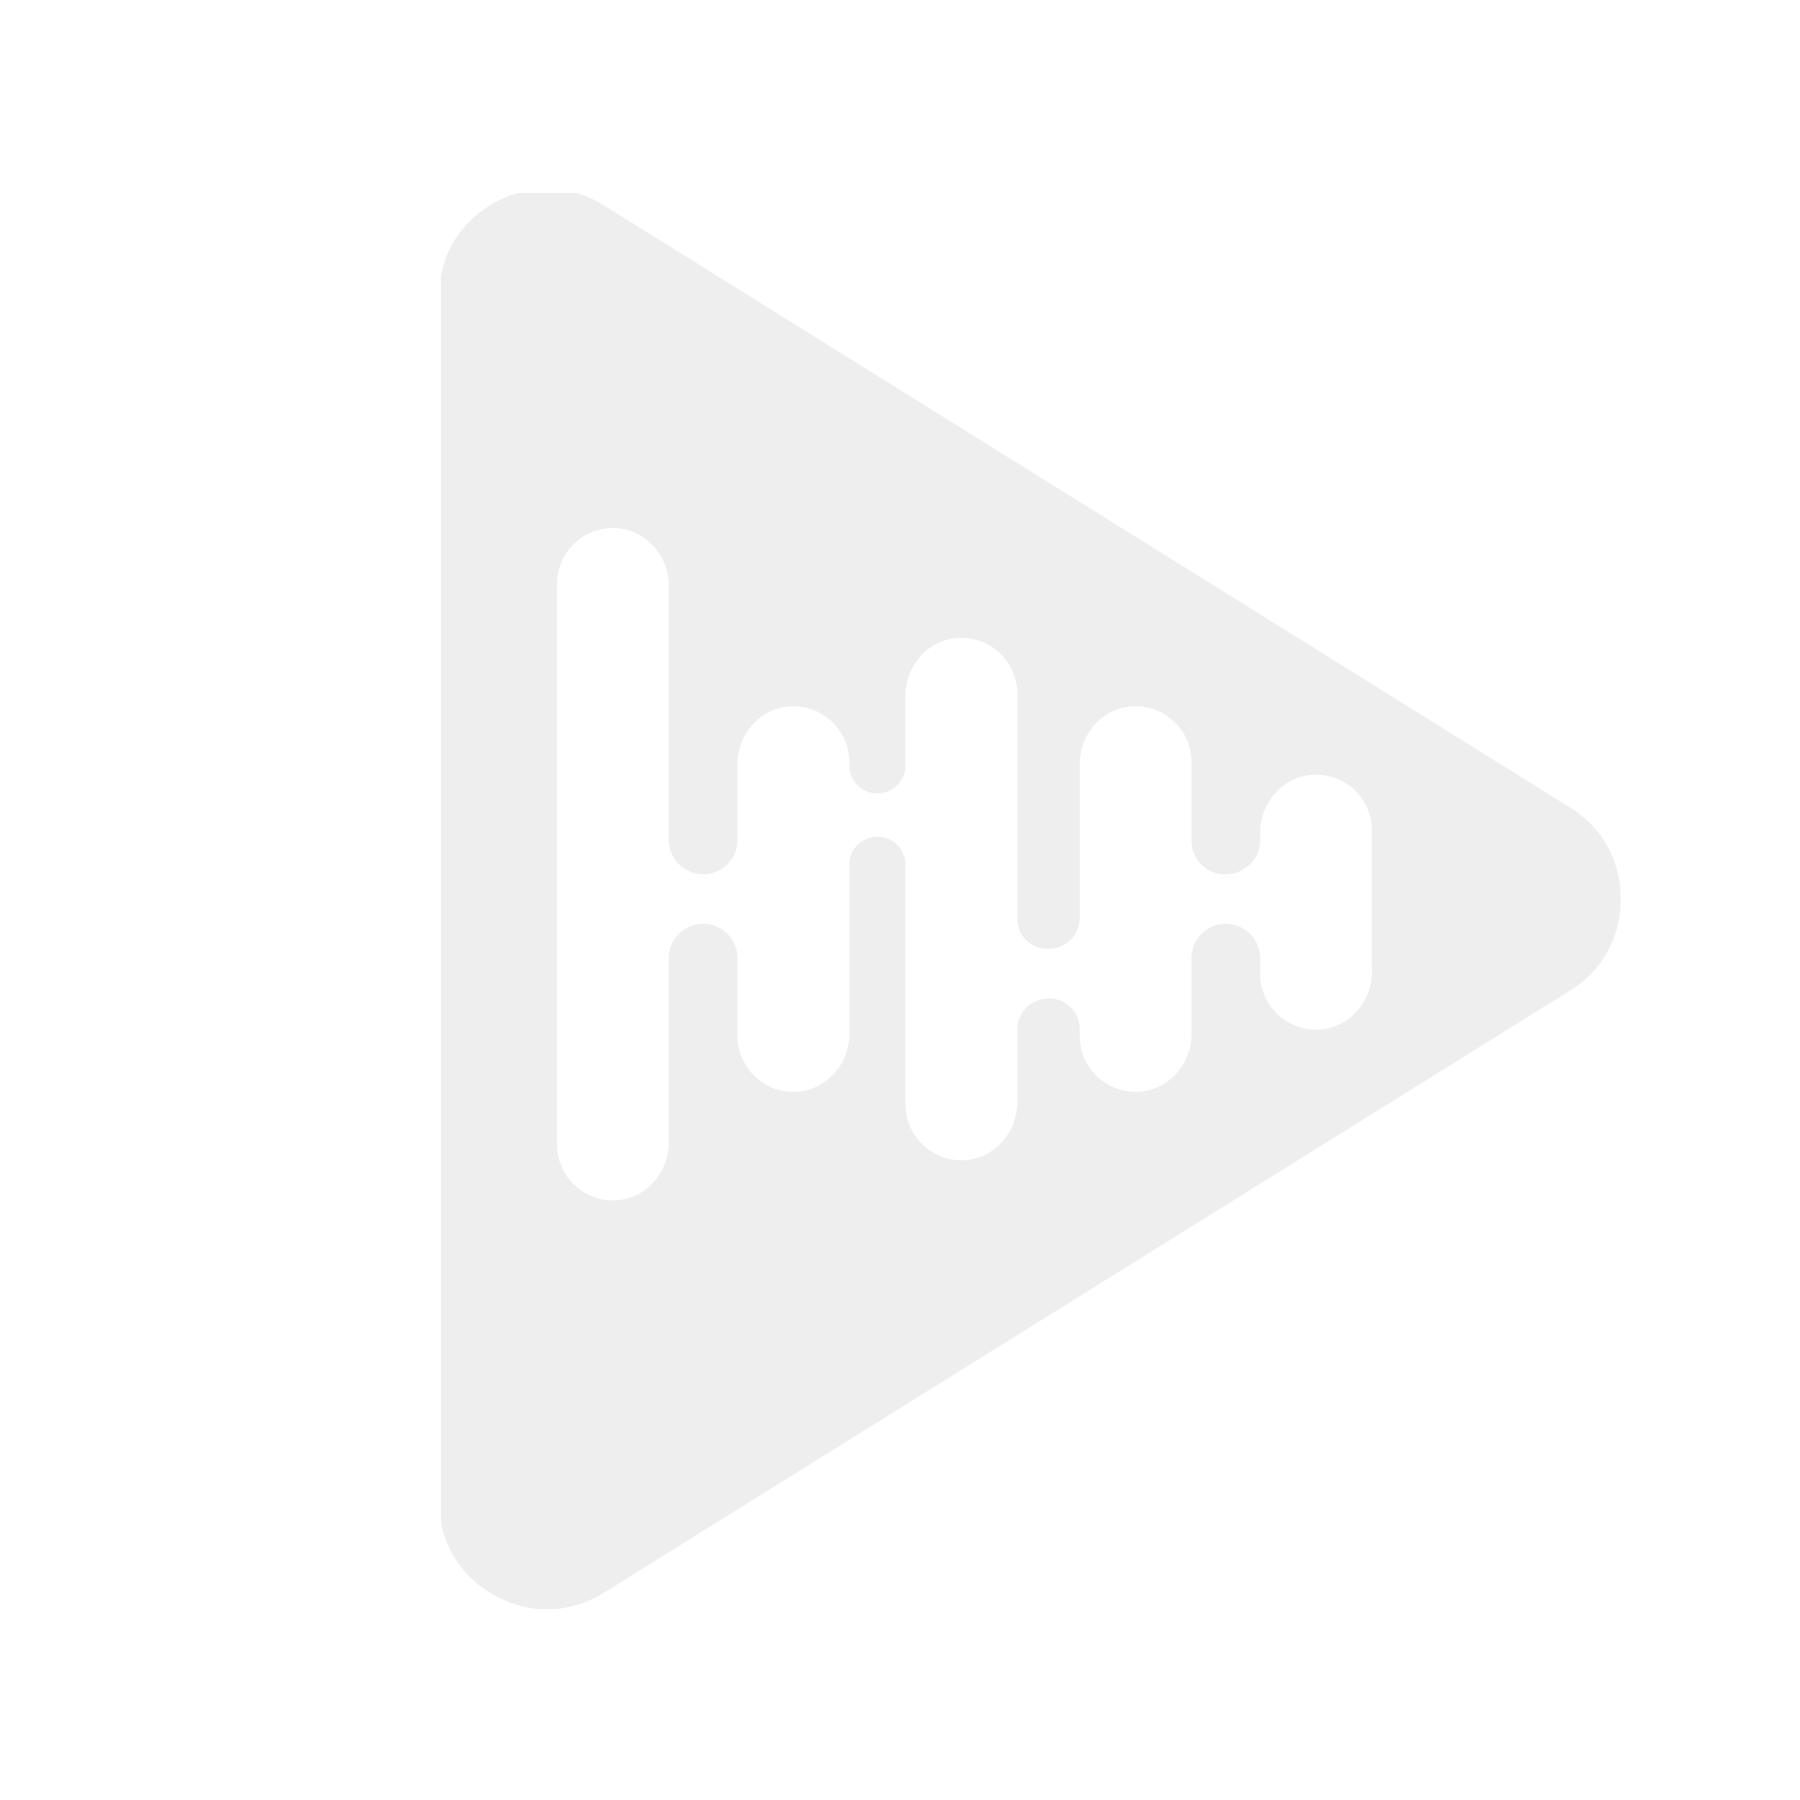 Grandview 148609 - Lerret Cyber, 16:9, 203x114, Manuelt 92